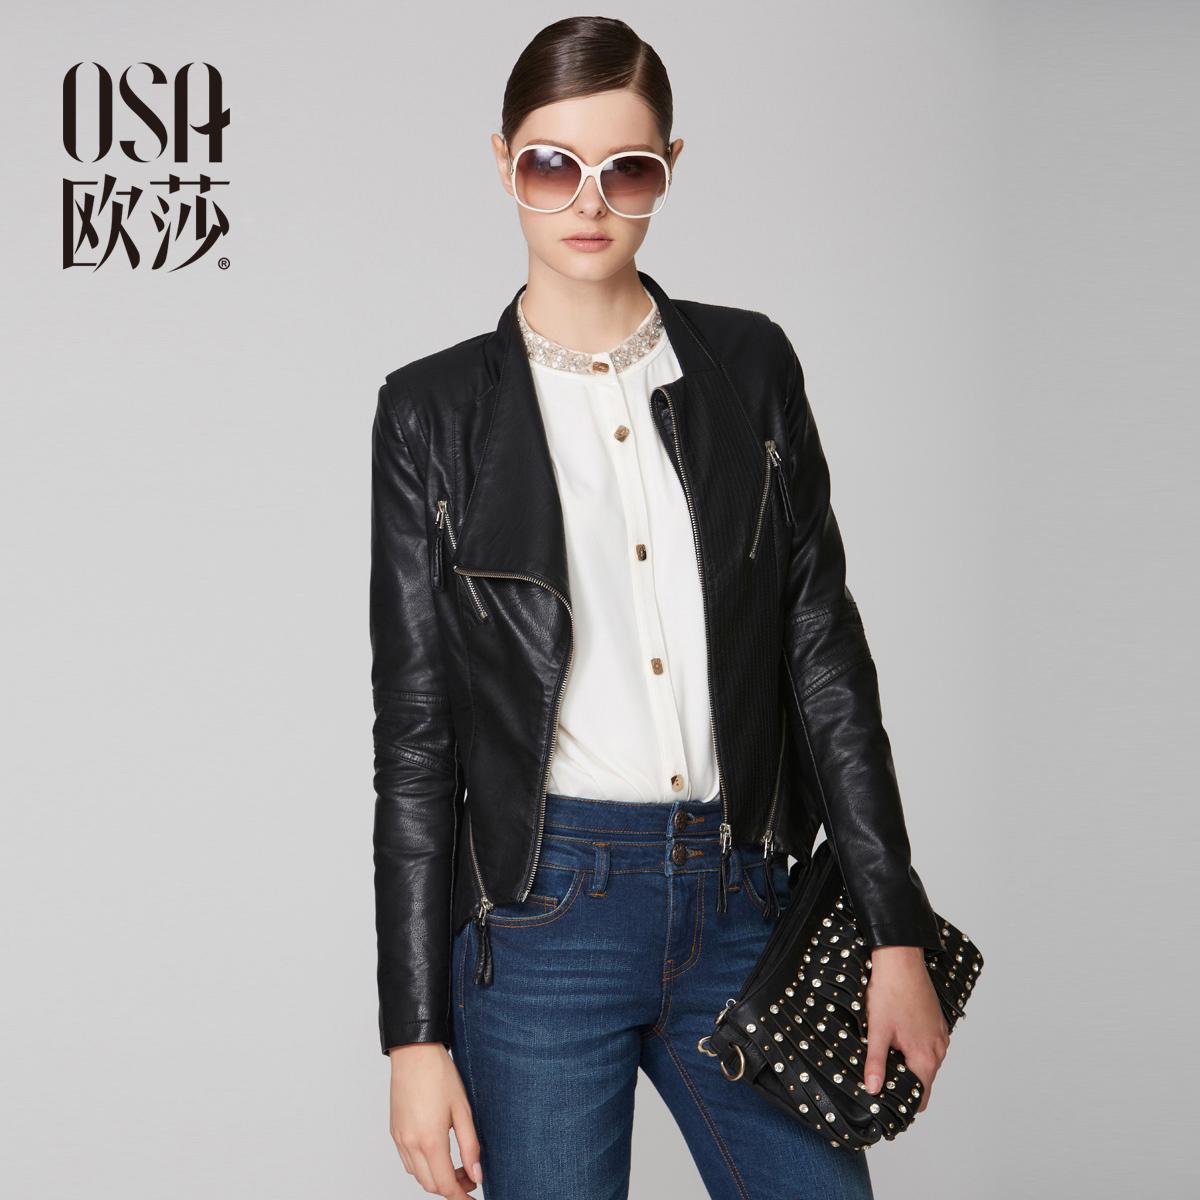 Кожаная куртка OSA sg35015 2013 G35015